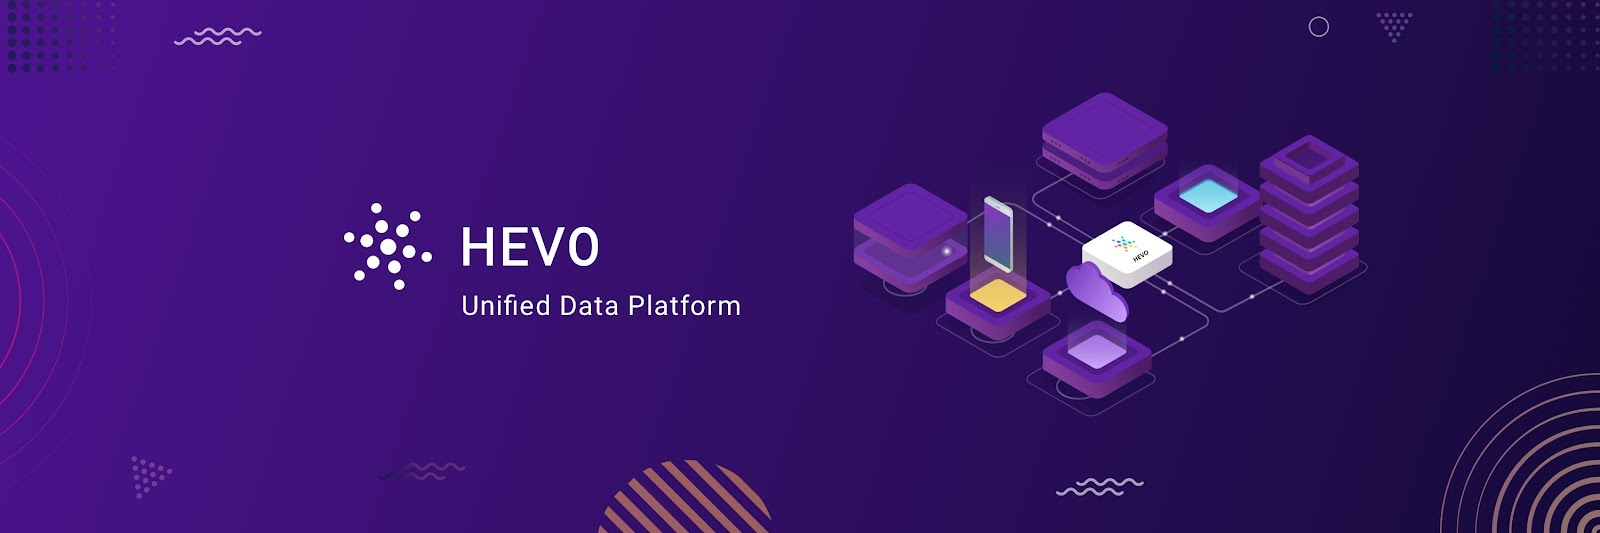 Hevo Data Logo(Data Management Tools)